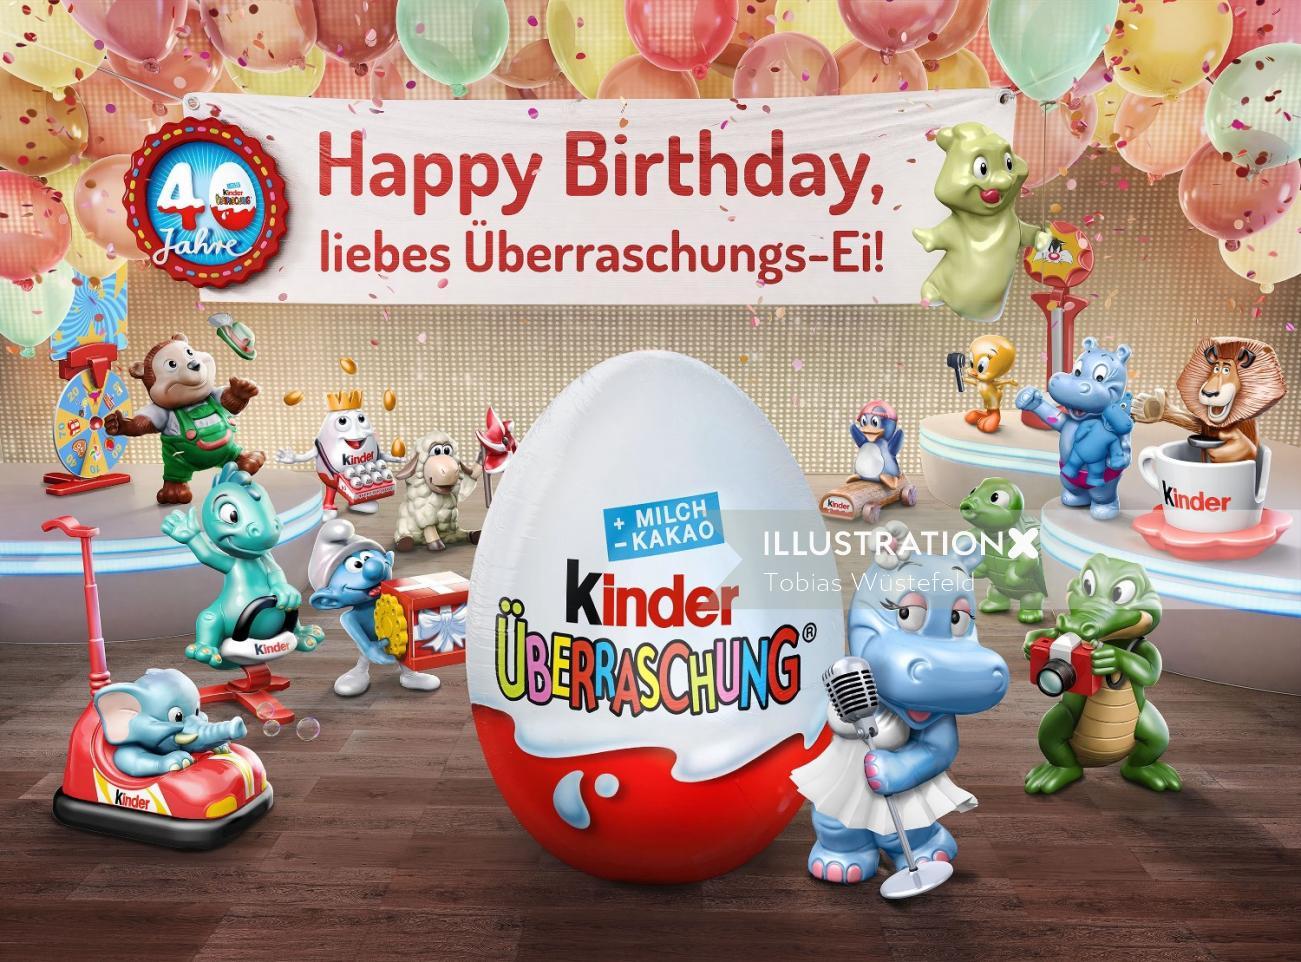 Illustration of happy birthday  Kinder Chocolate